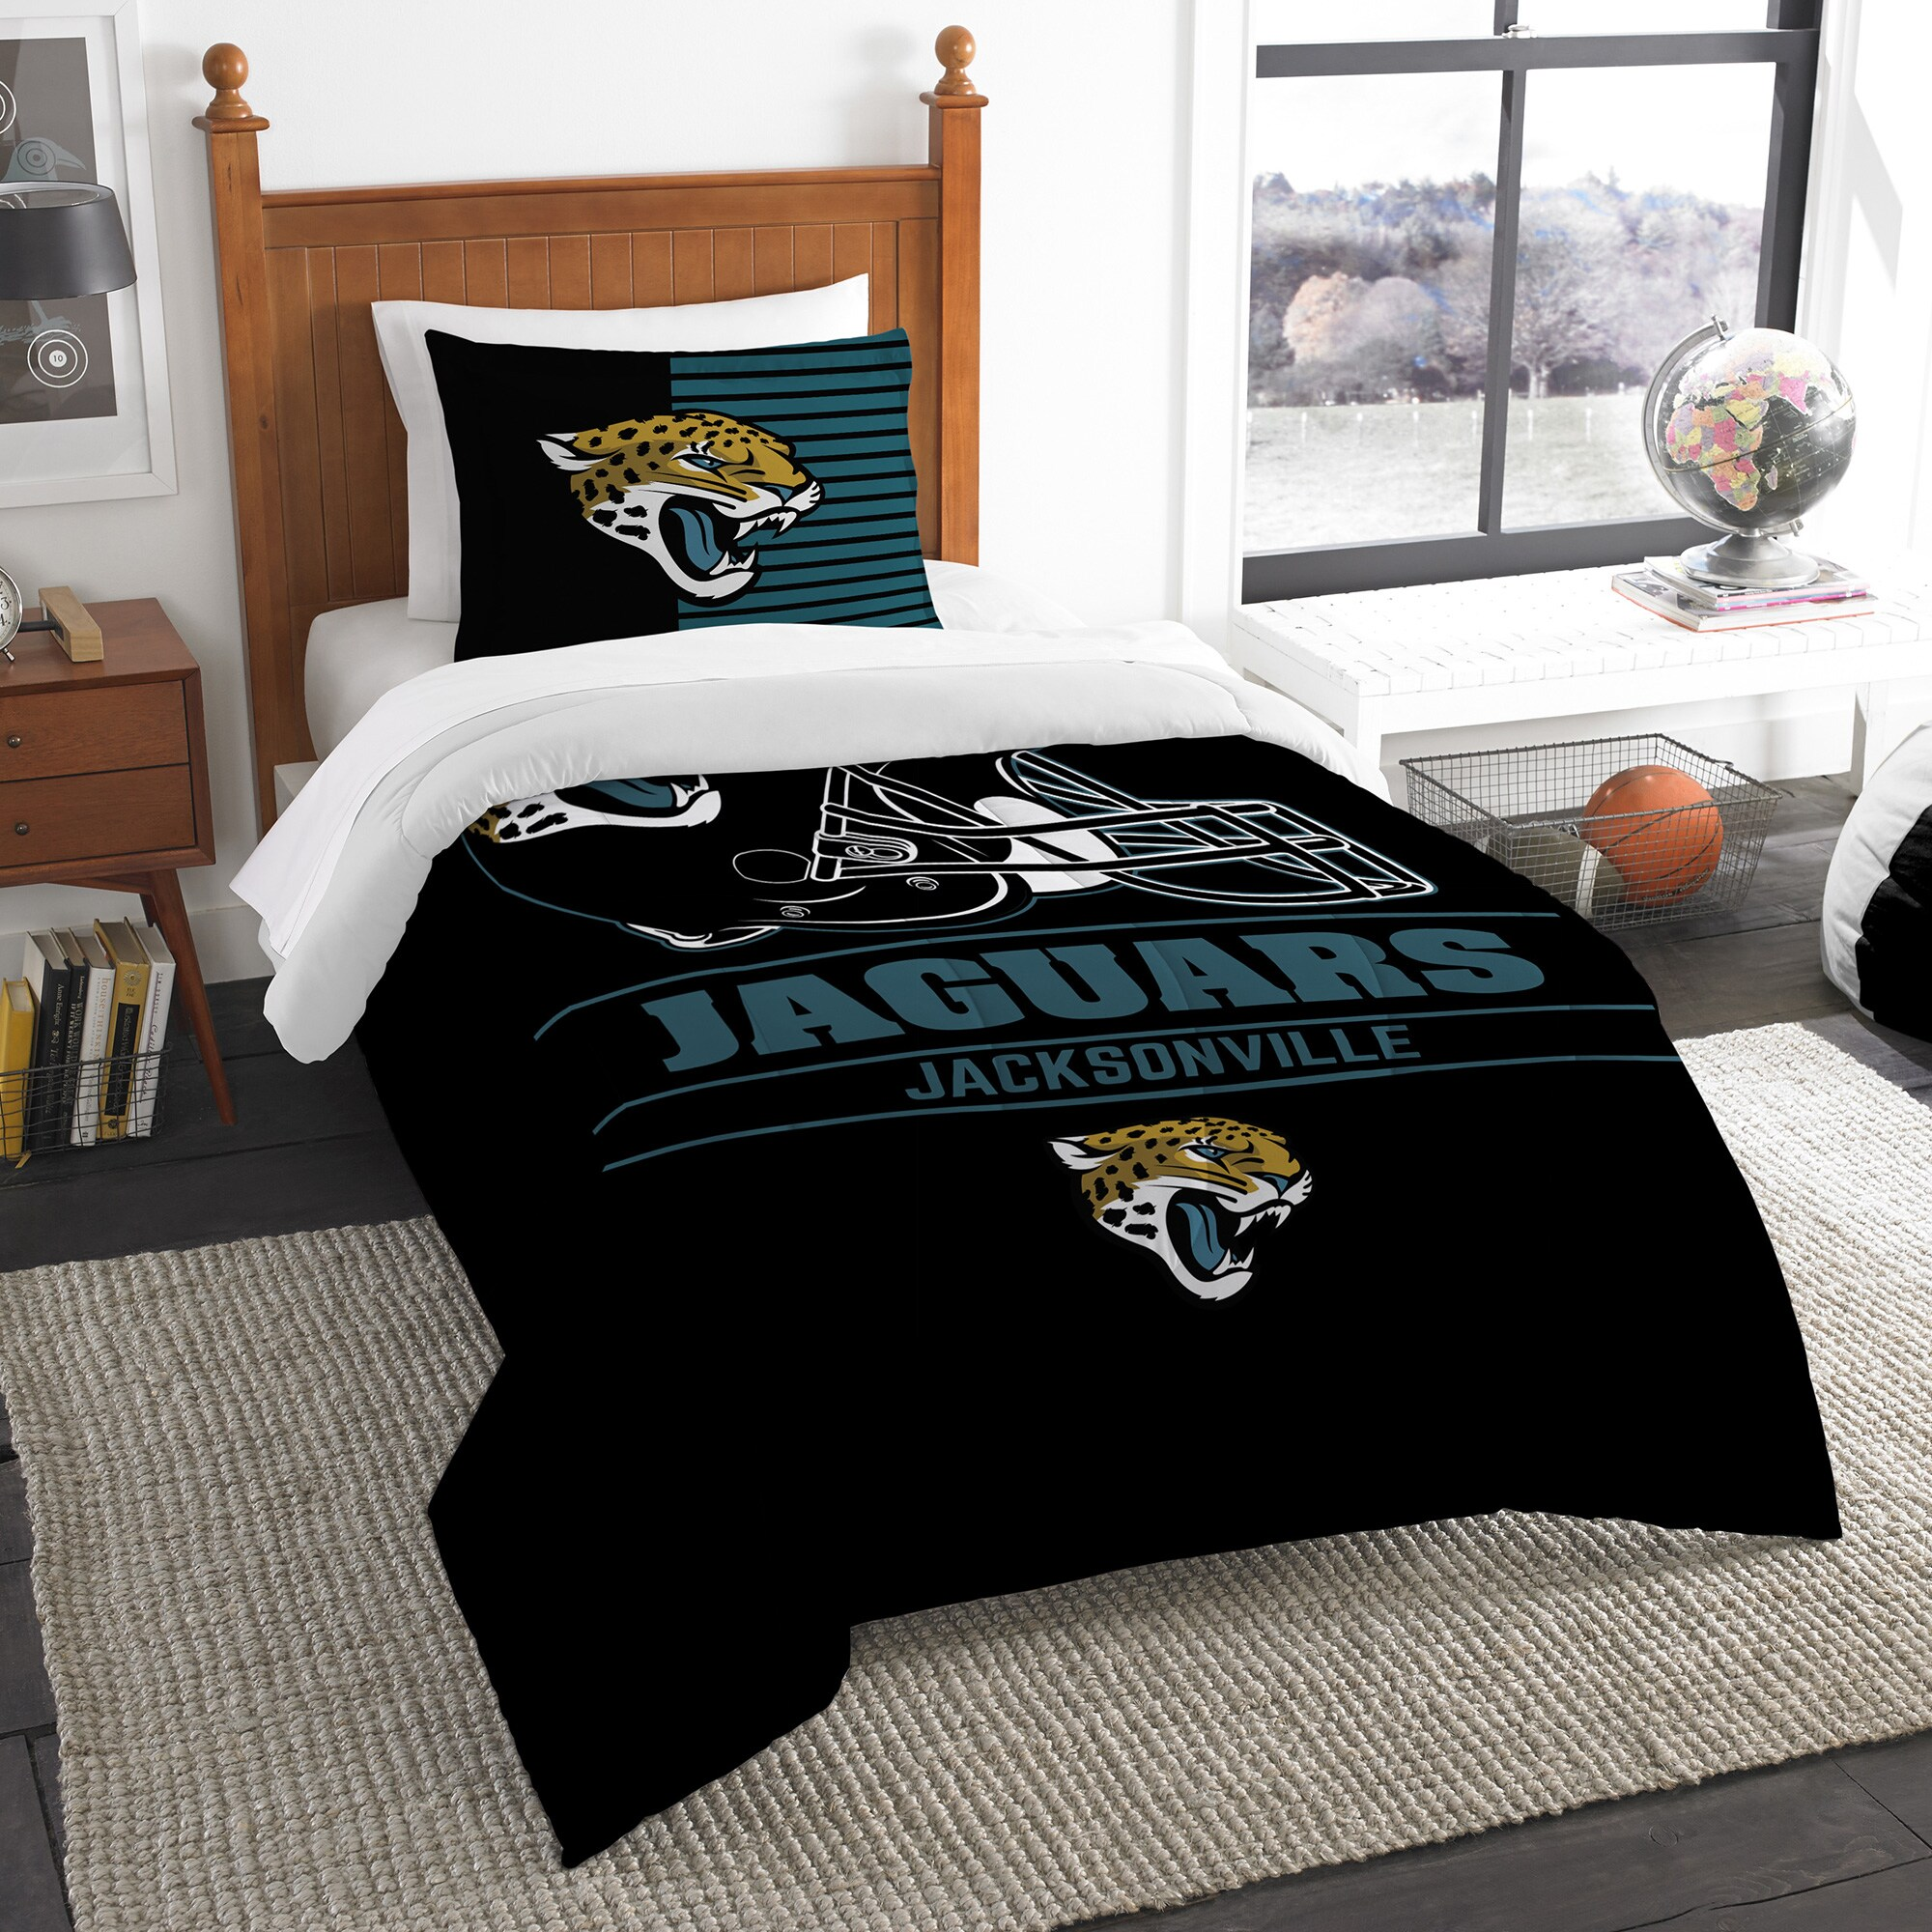 Jacksonville Jaguars The Northwest Company NFL Draft Twin Comforter Set